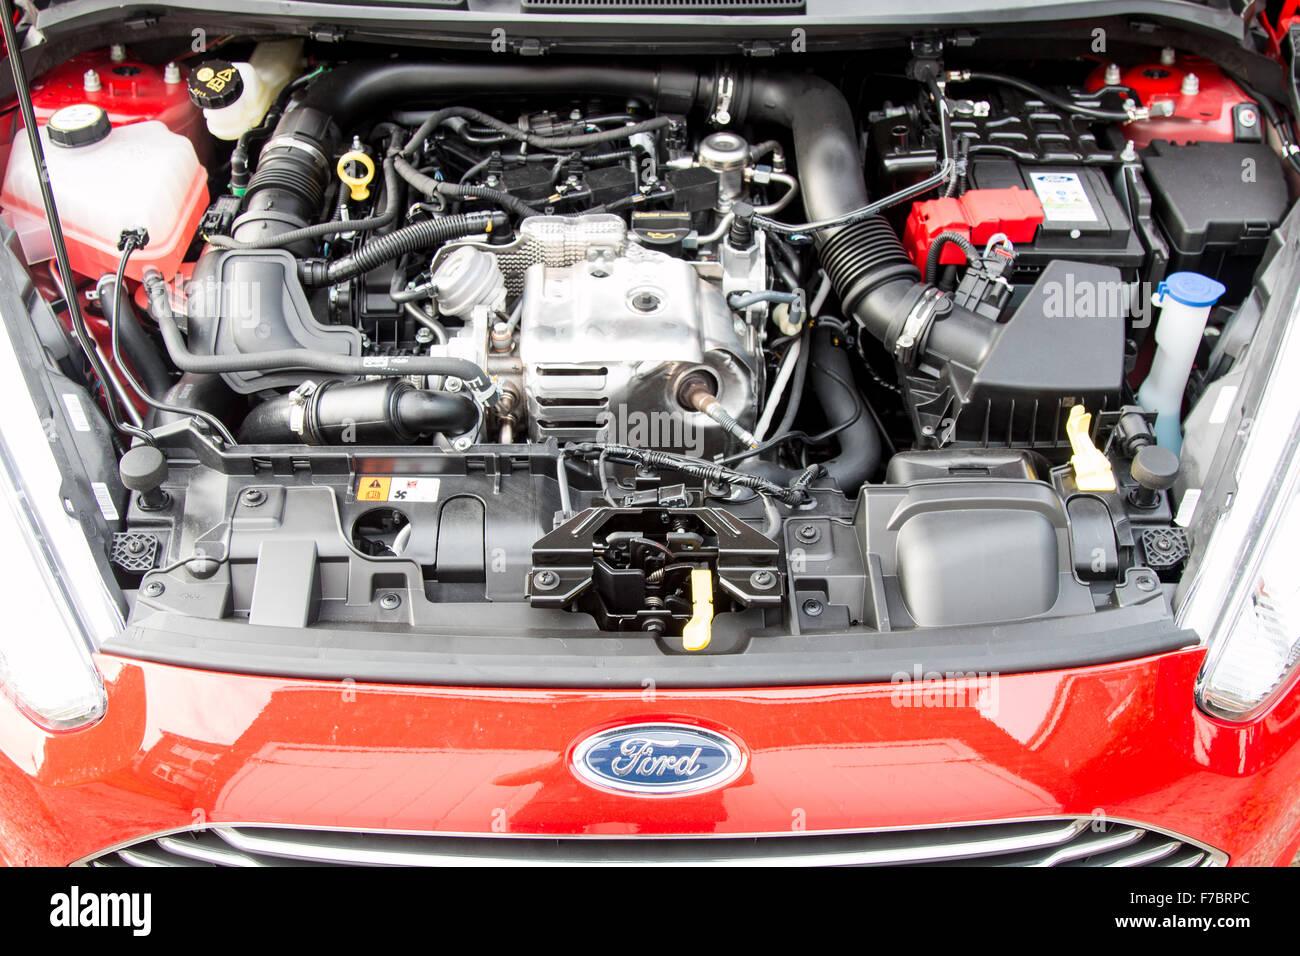 2011 Ford Fiesta Engine Compartment Diagram  Ford  Auto